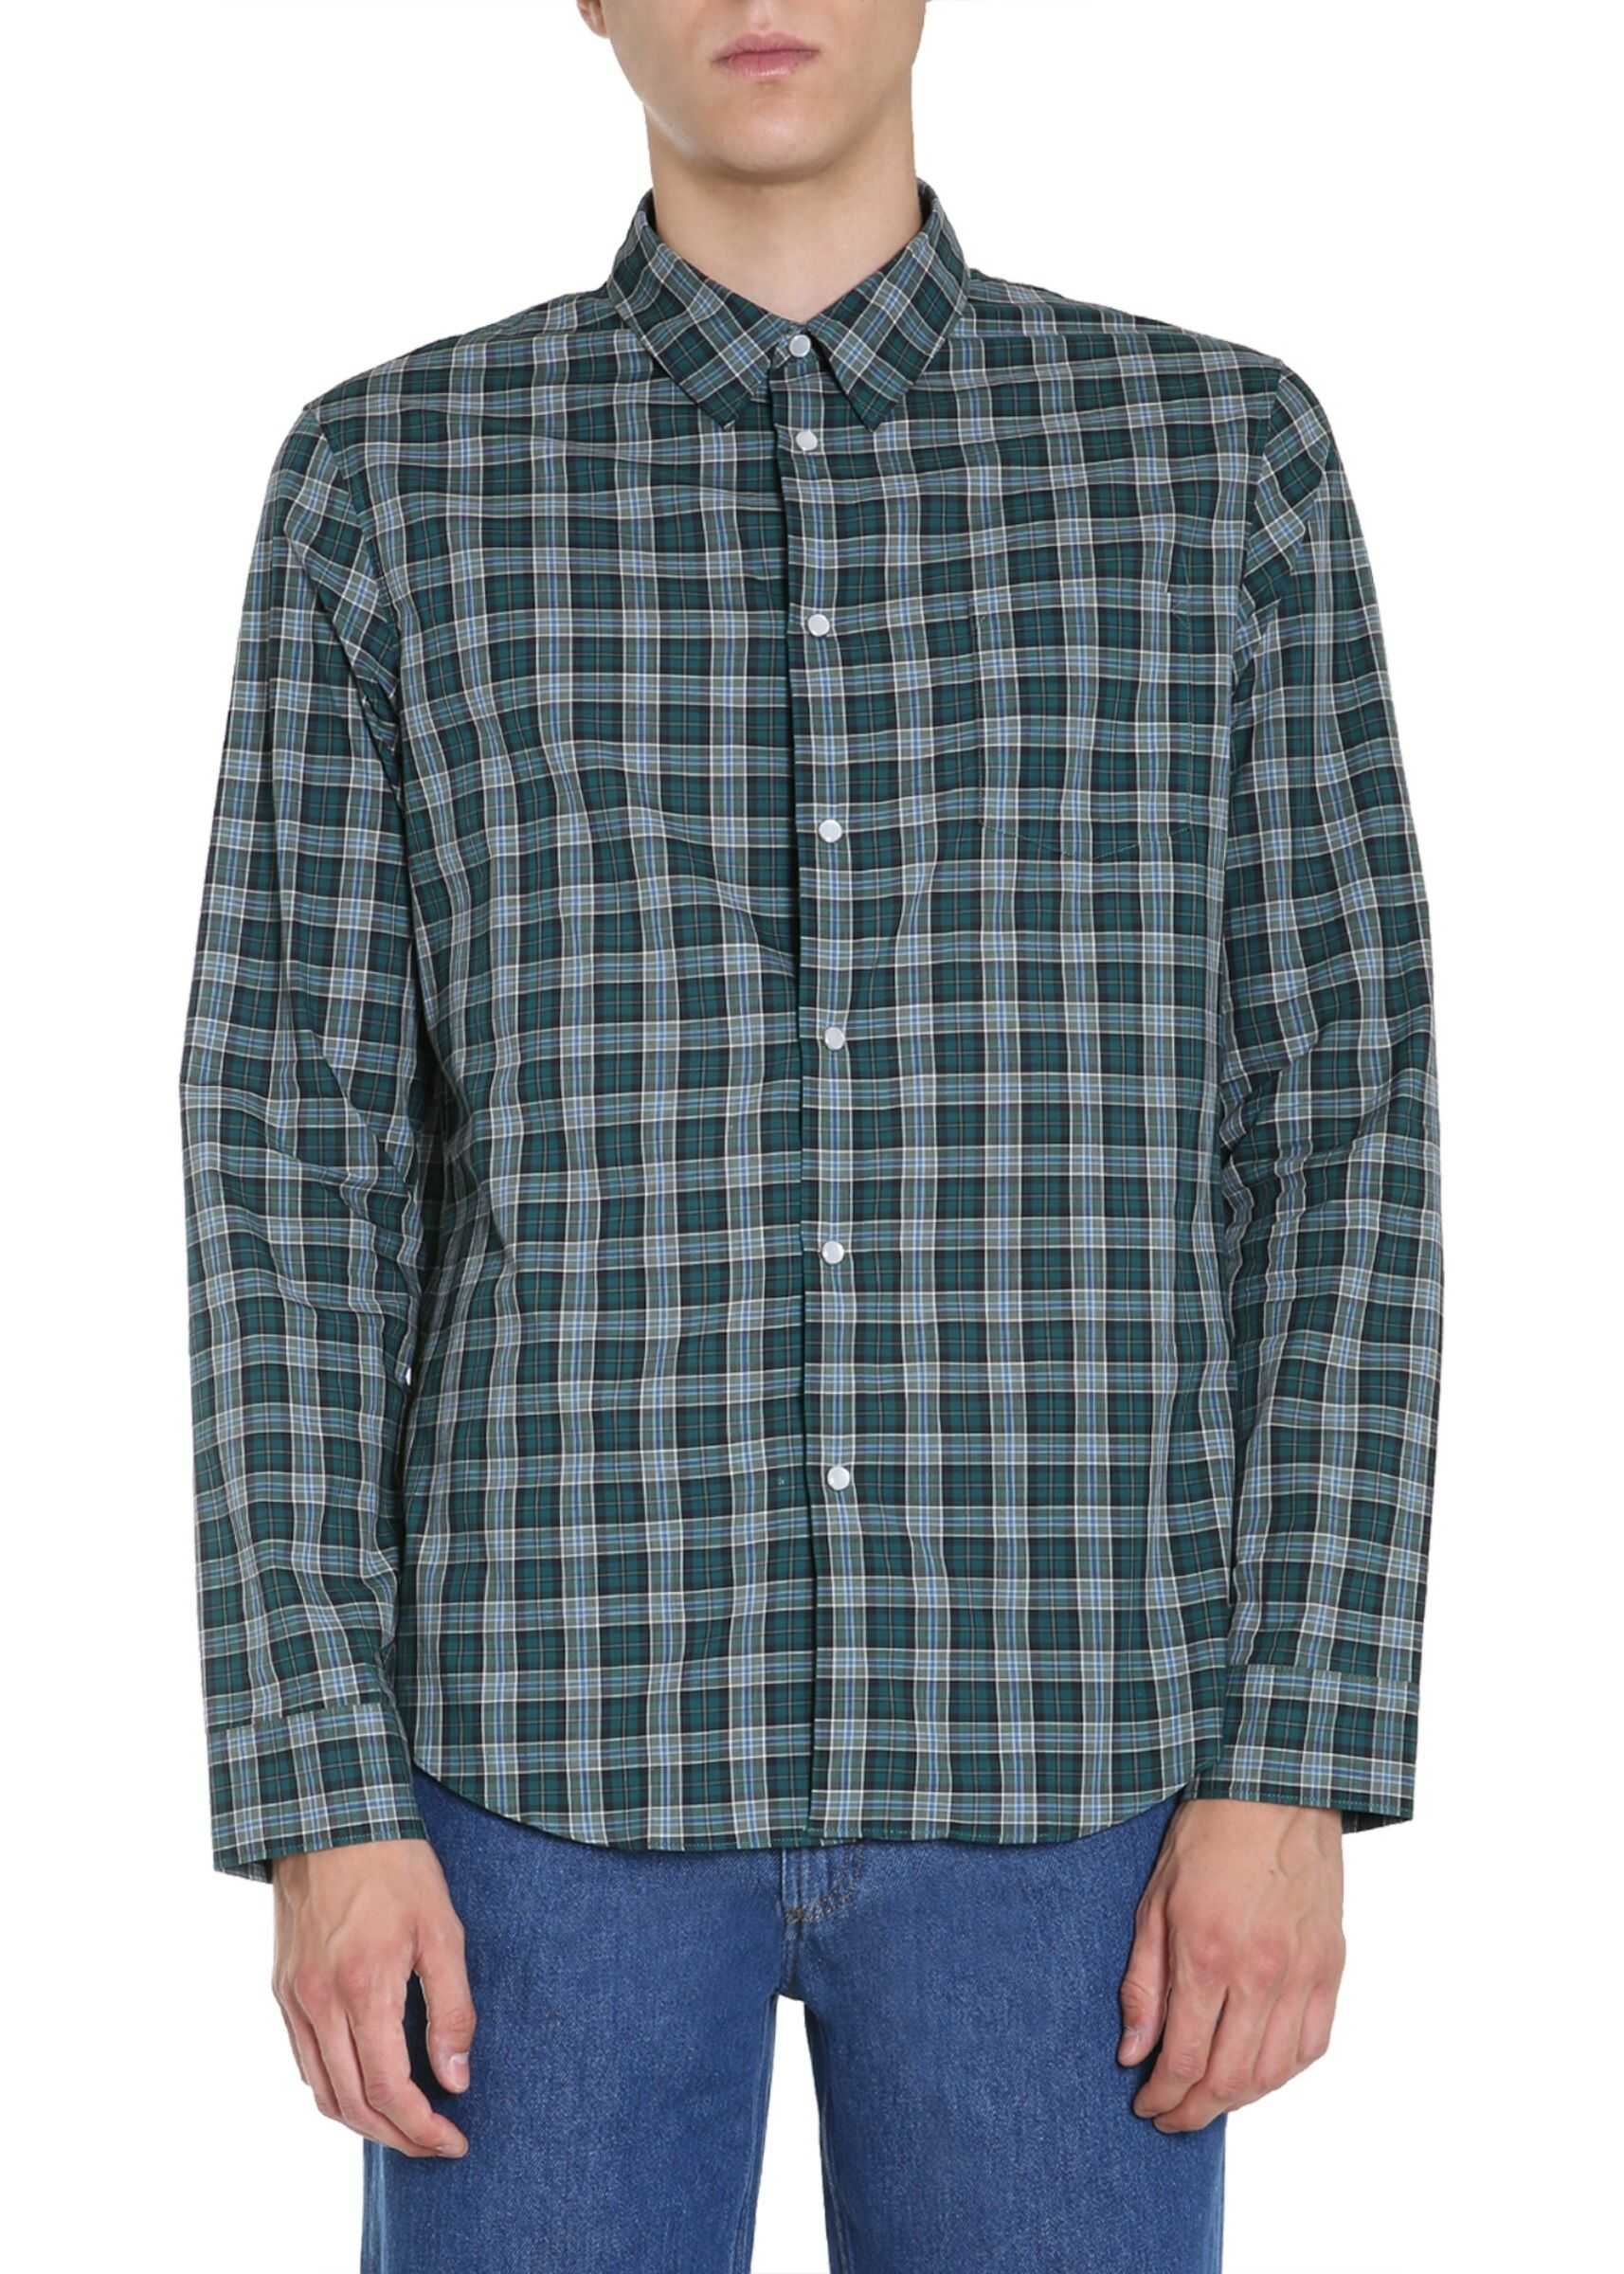 Kenzo Slim Fit Shirt GREEN imagine